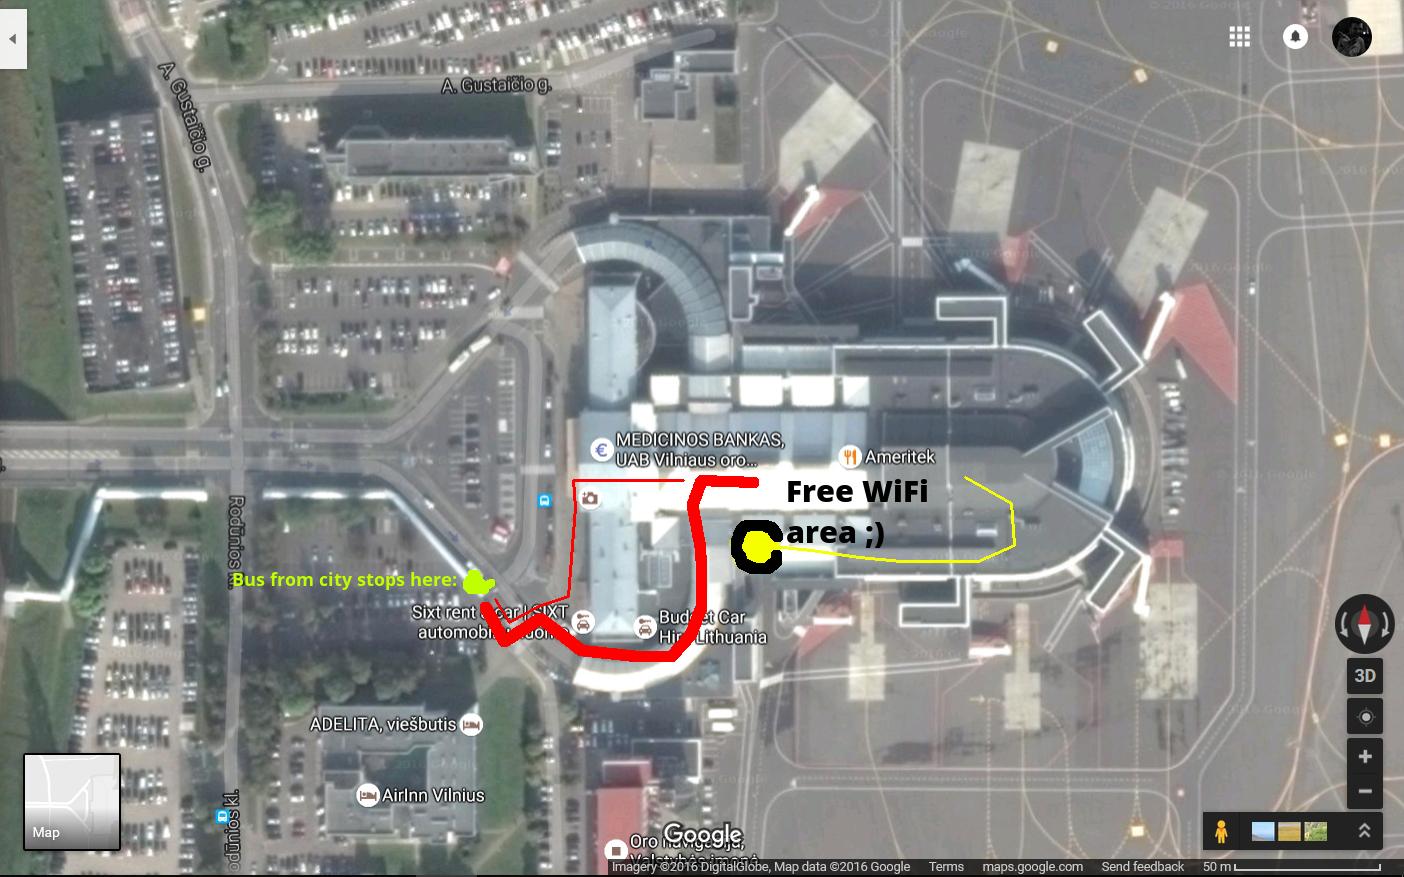 Vilnius airport instructions